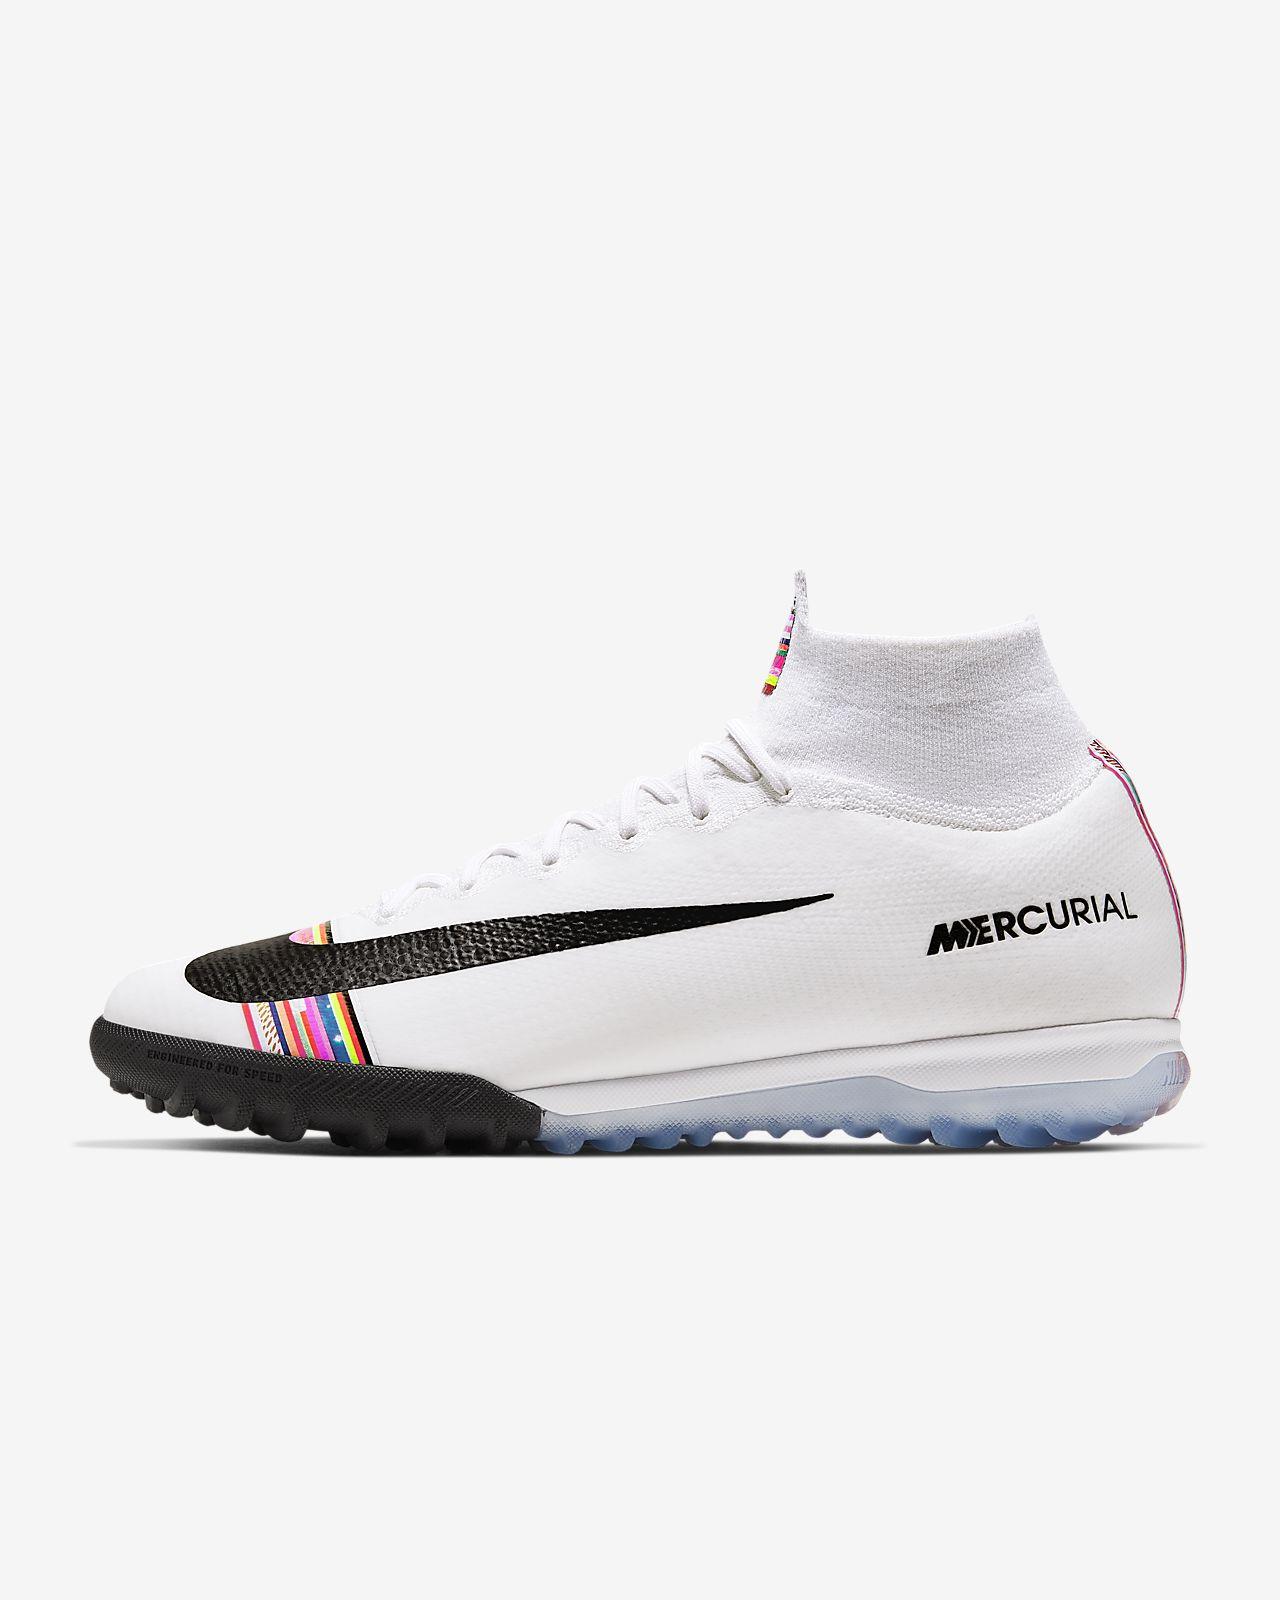 90cc019abdd Nike SuperflyX 6 Elite LVL UP TF Turf Soccer Shoe. Nike.com